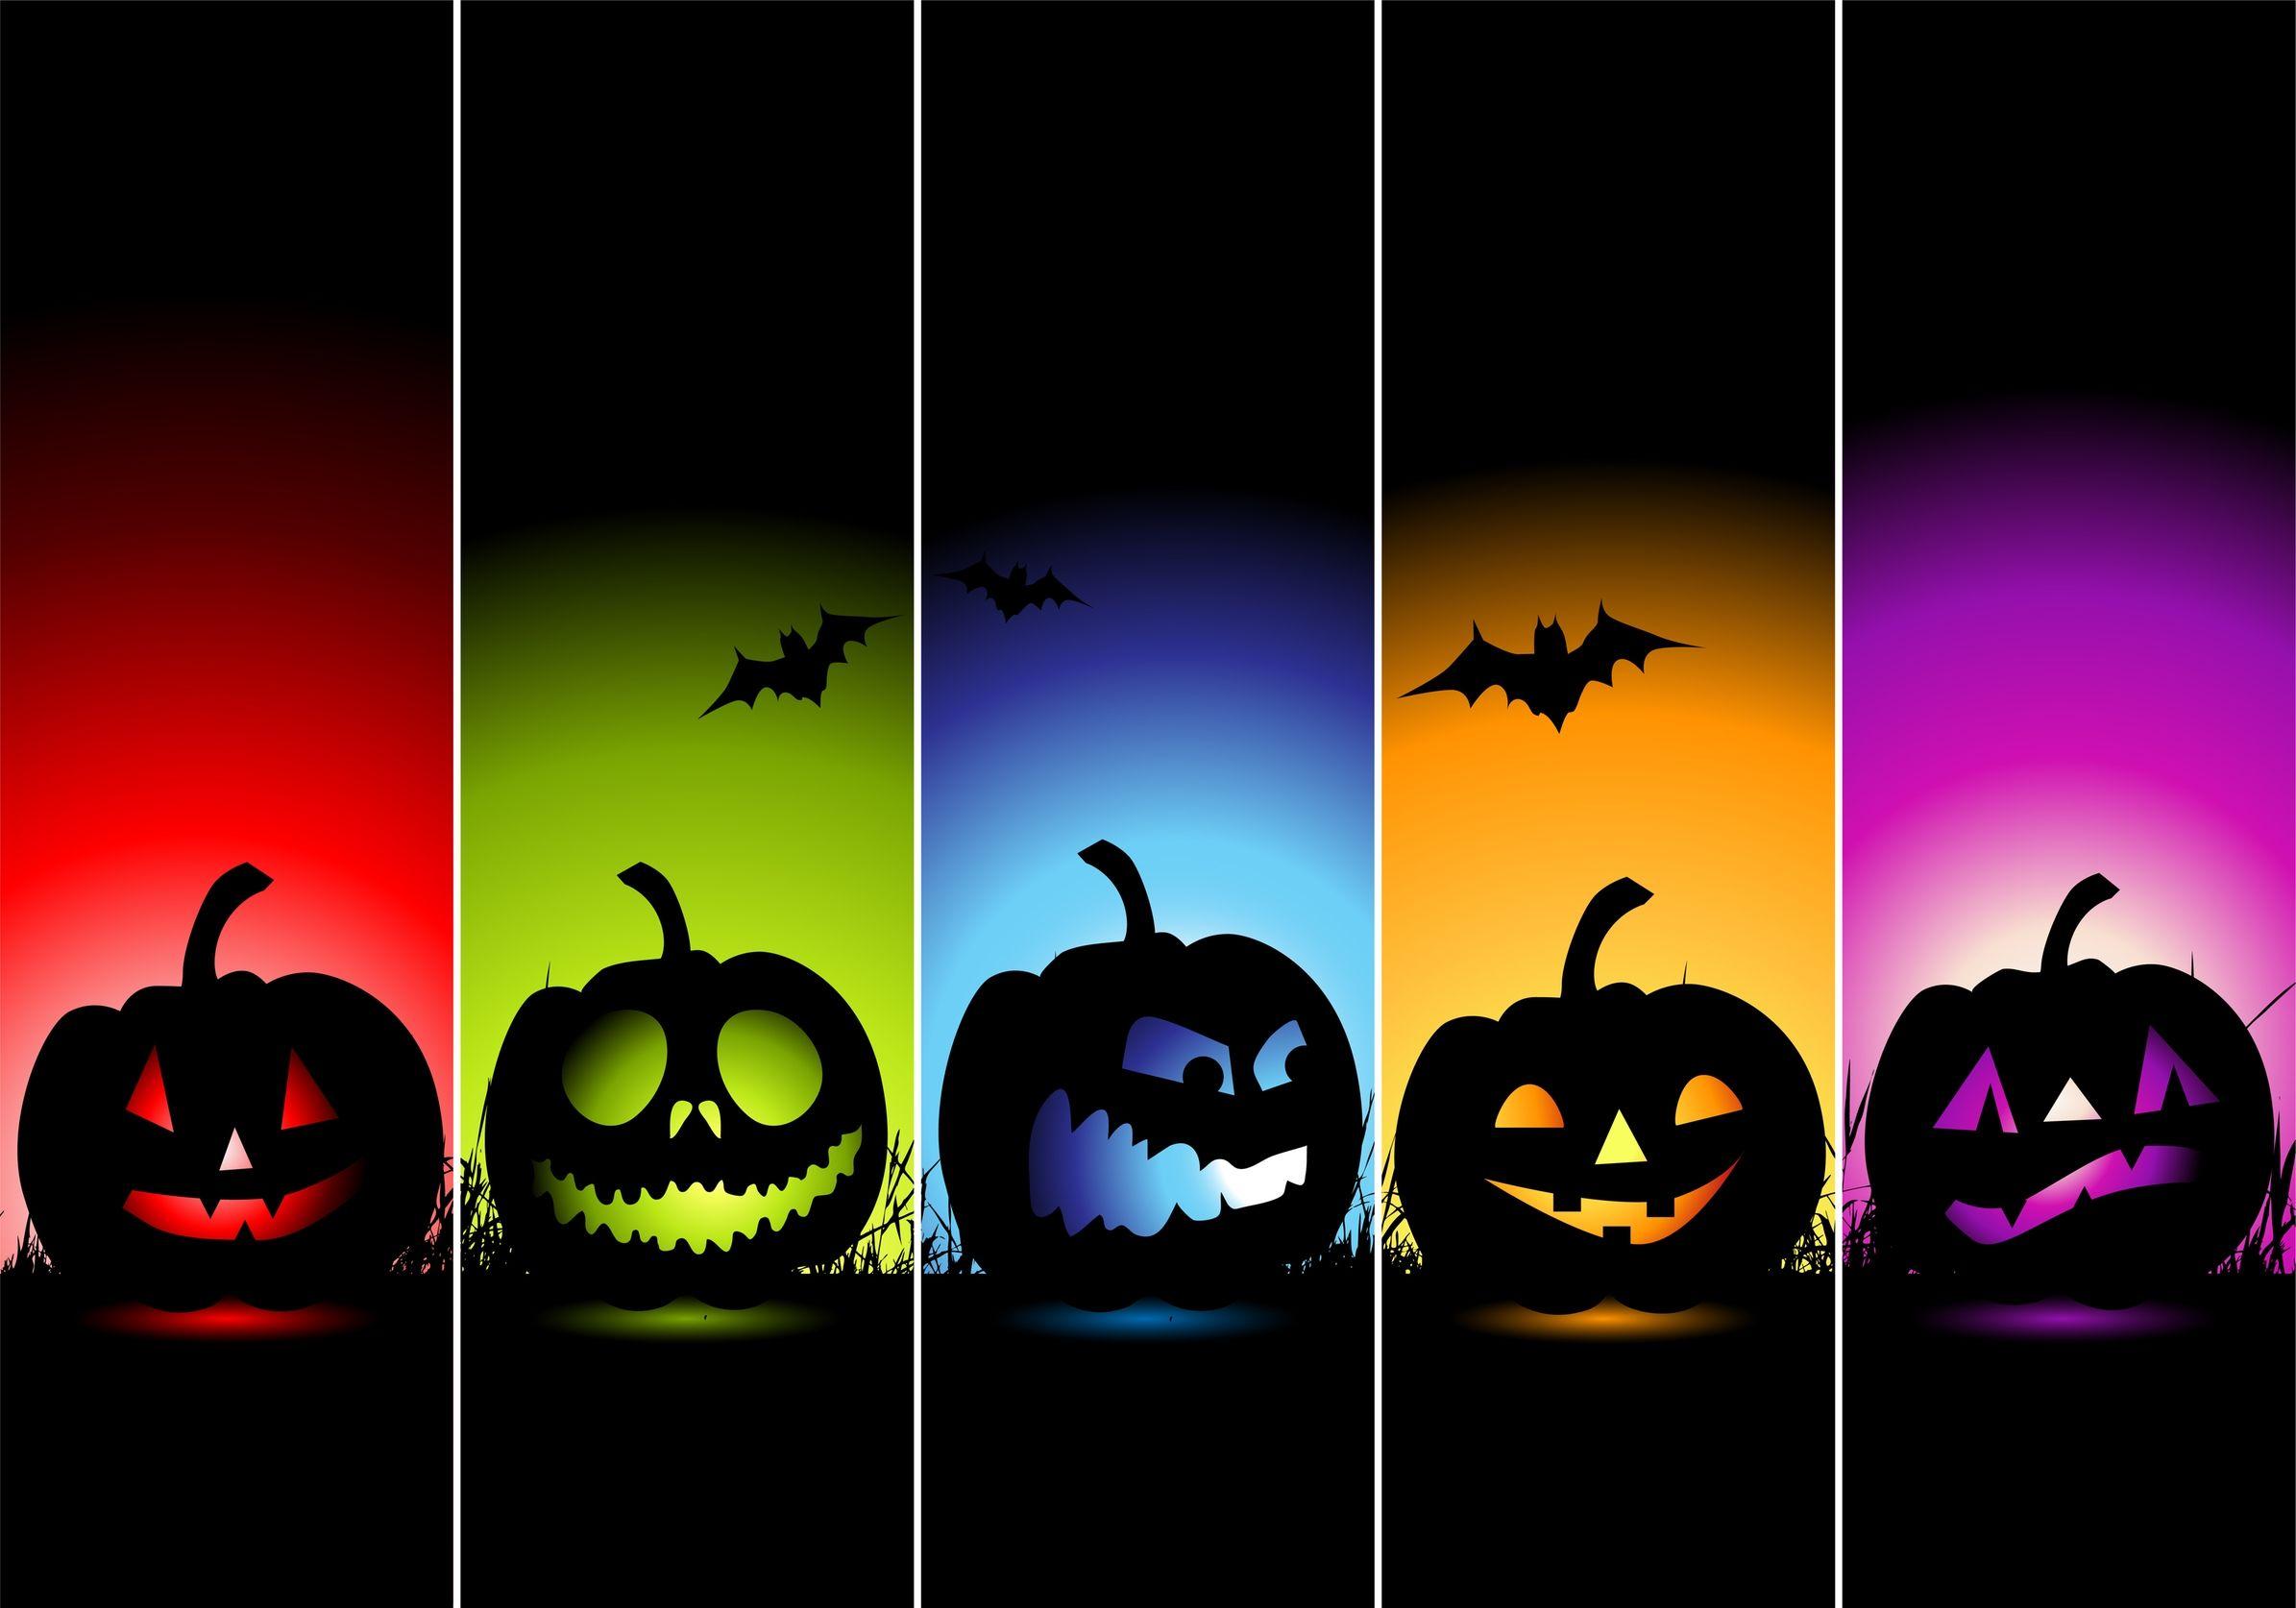 halloween wallpaper for kids